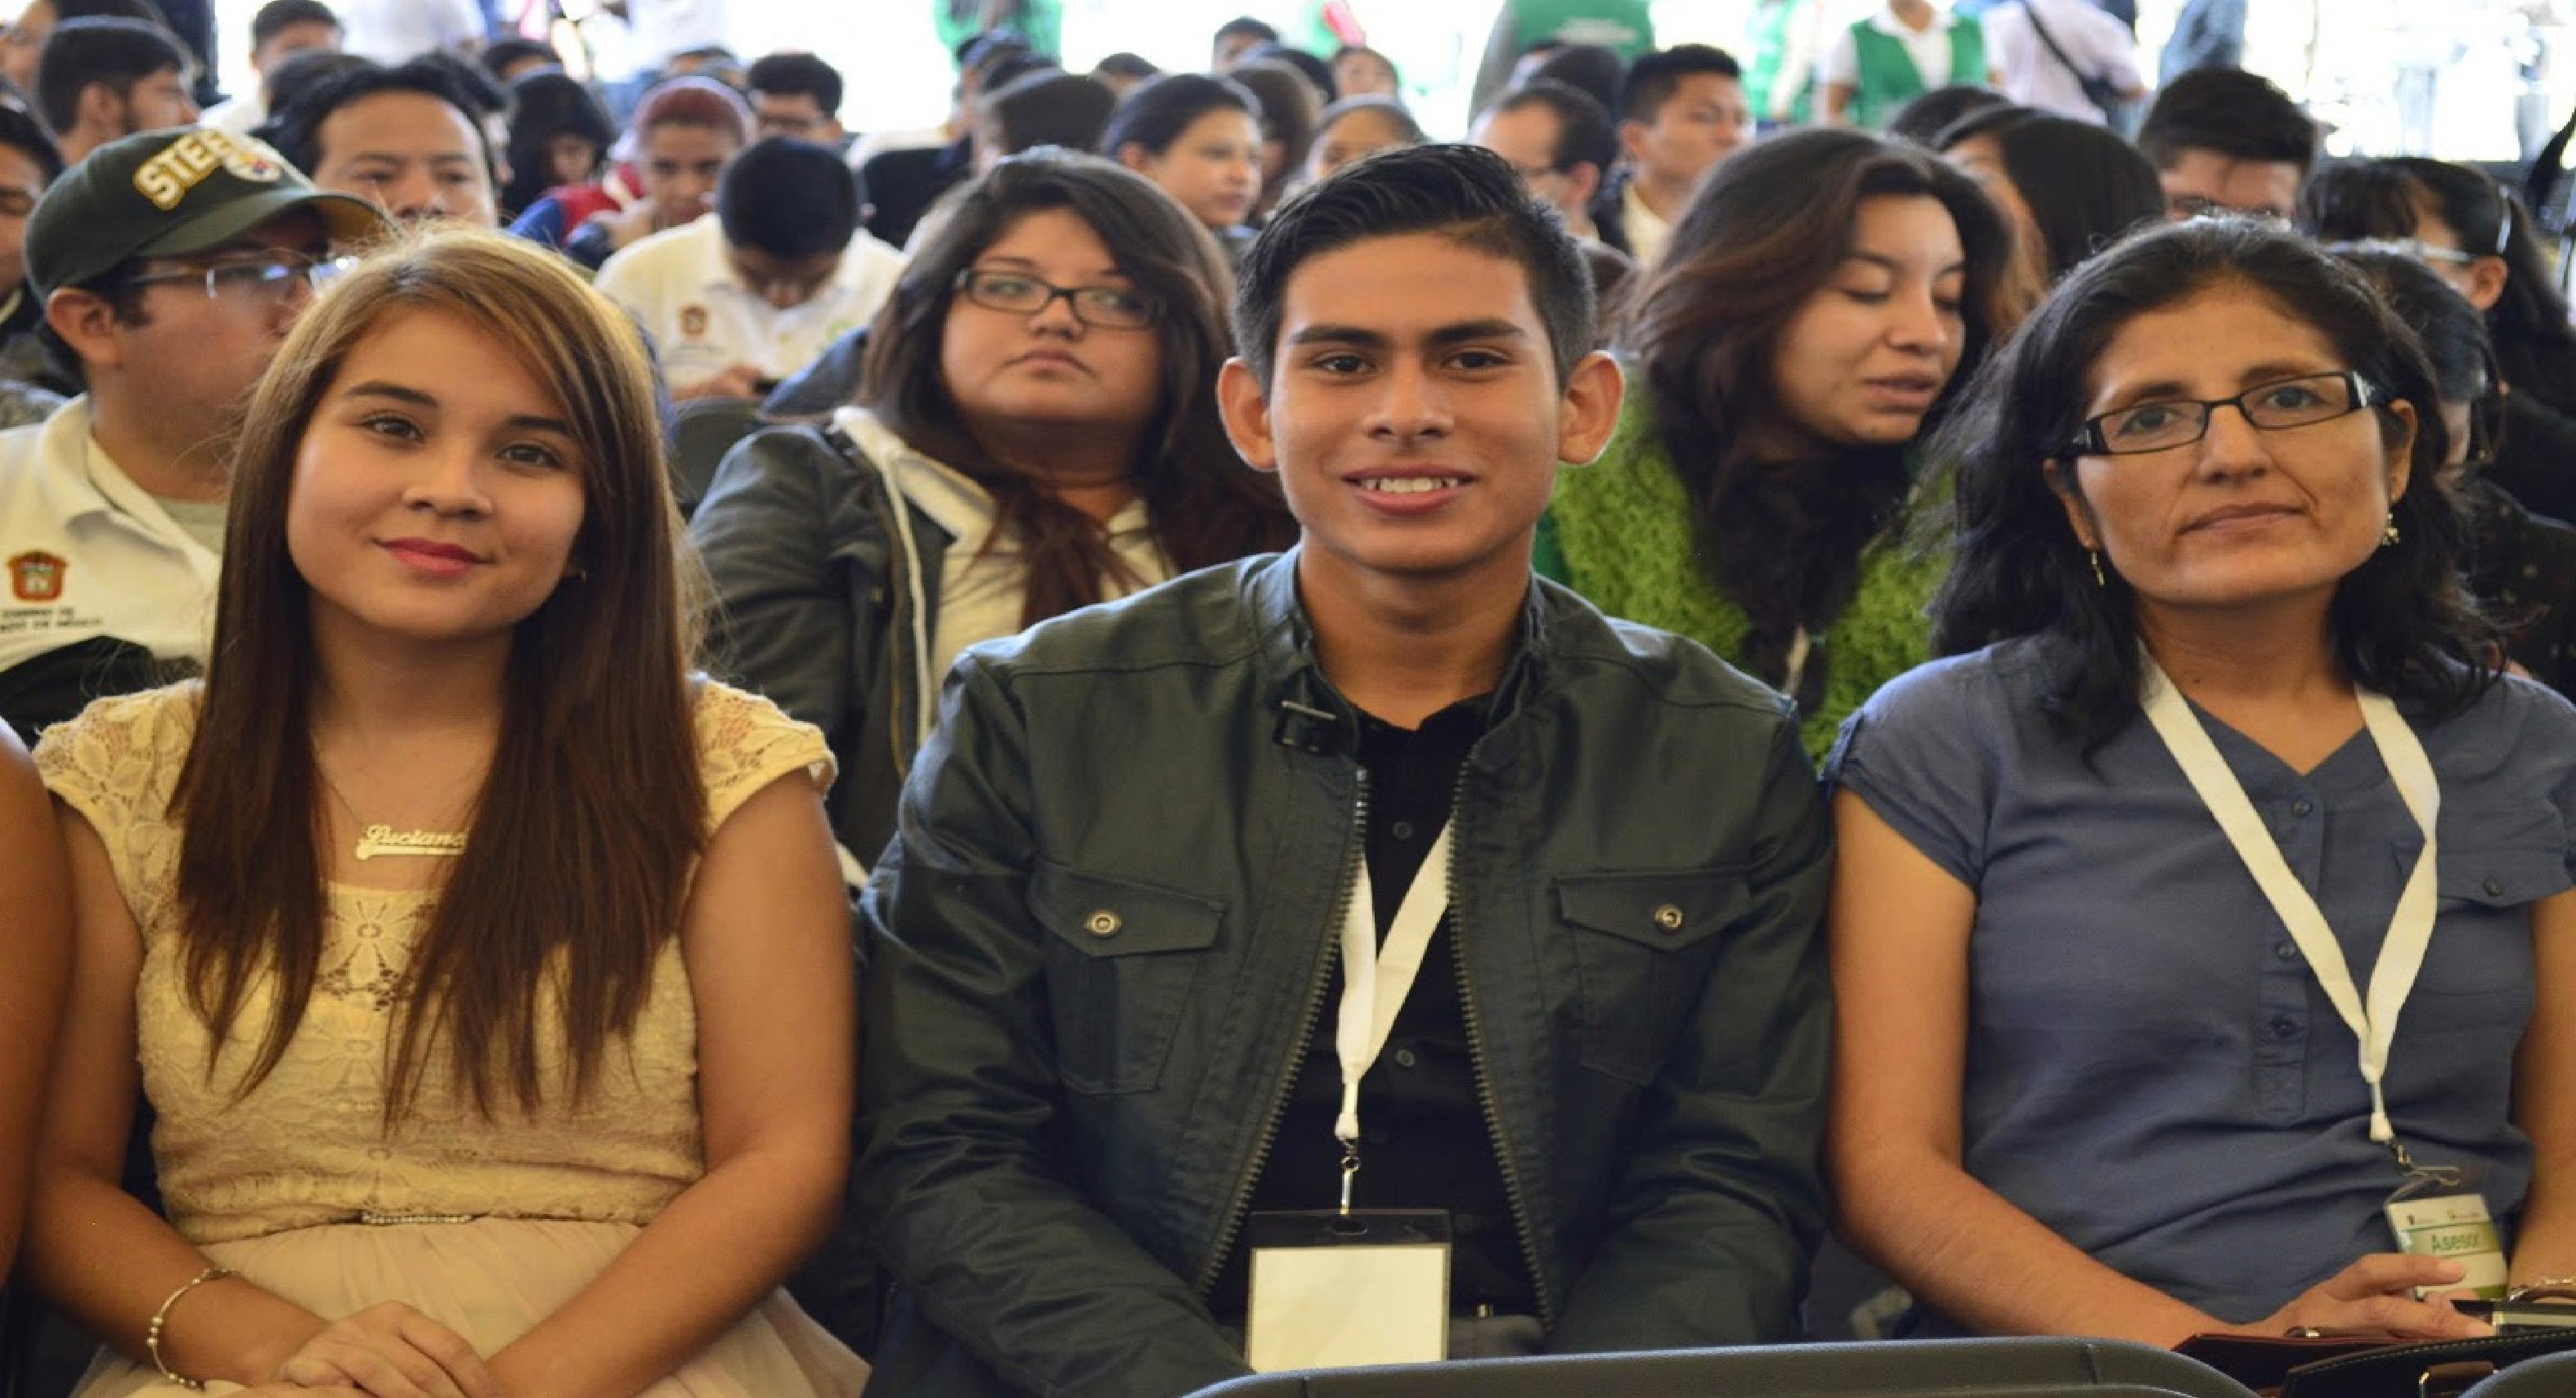 Becas Benito Juárez || Comienza registro para estudiantes mexiquenses de nivel medio superior